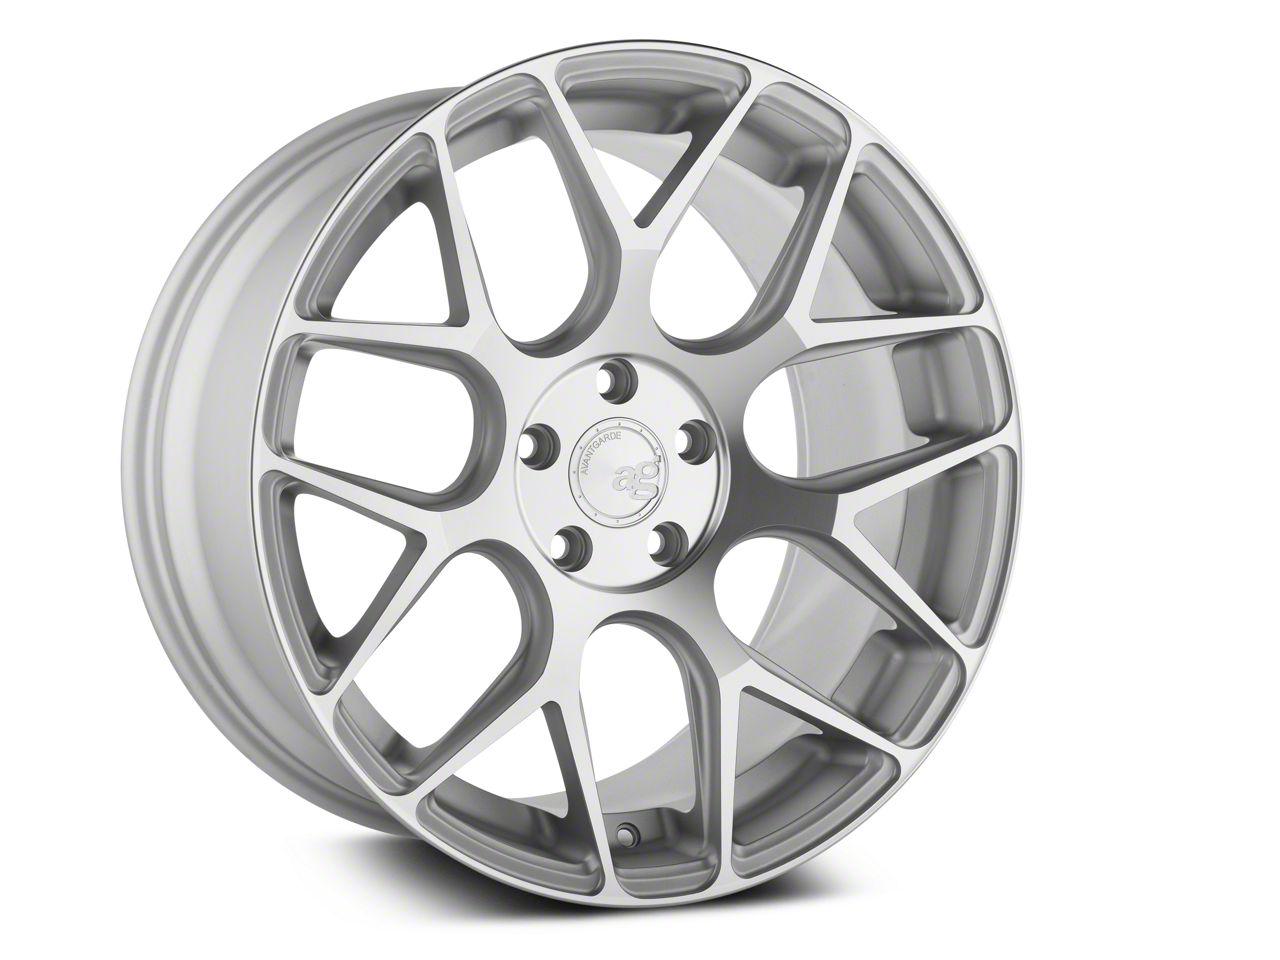 Avant Garde M590 Satin Silver Wheel - 20x10 - Rear Only (05-14 All)